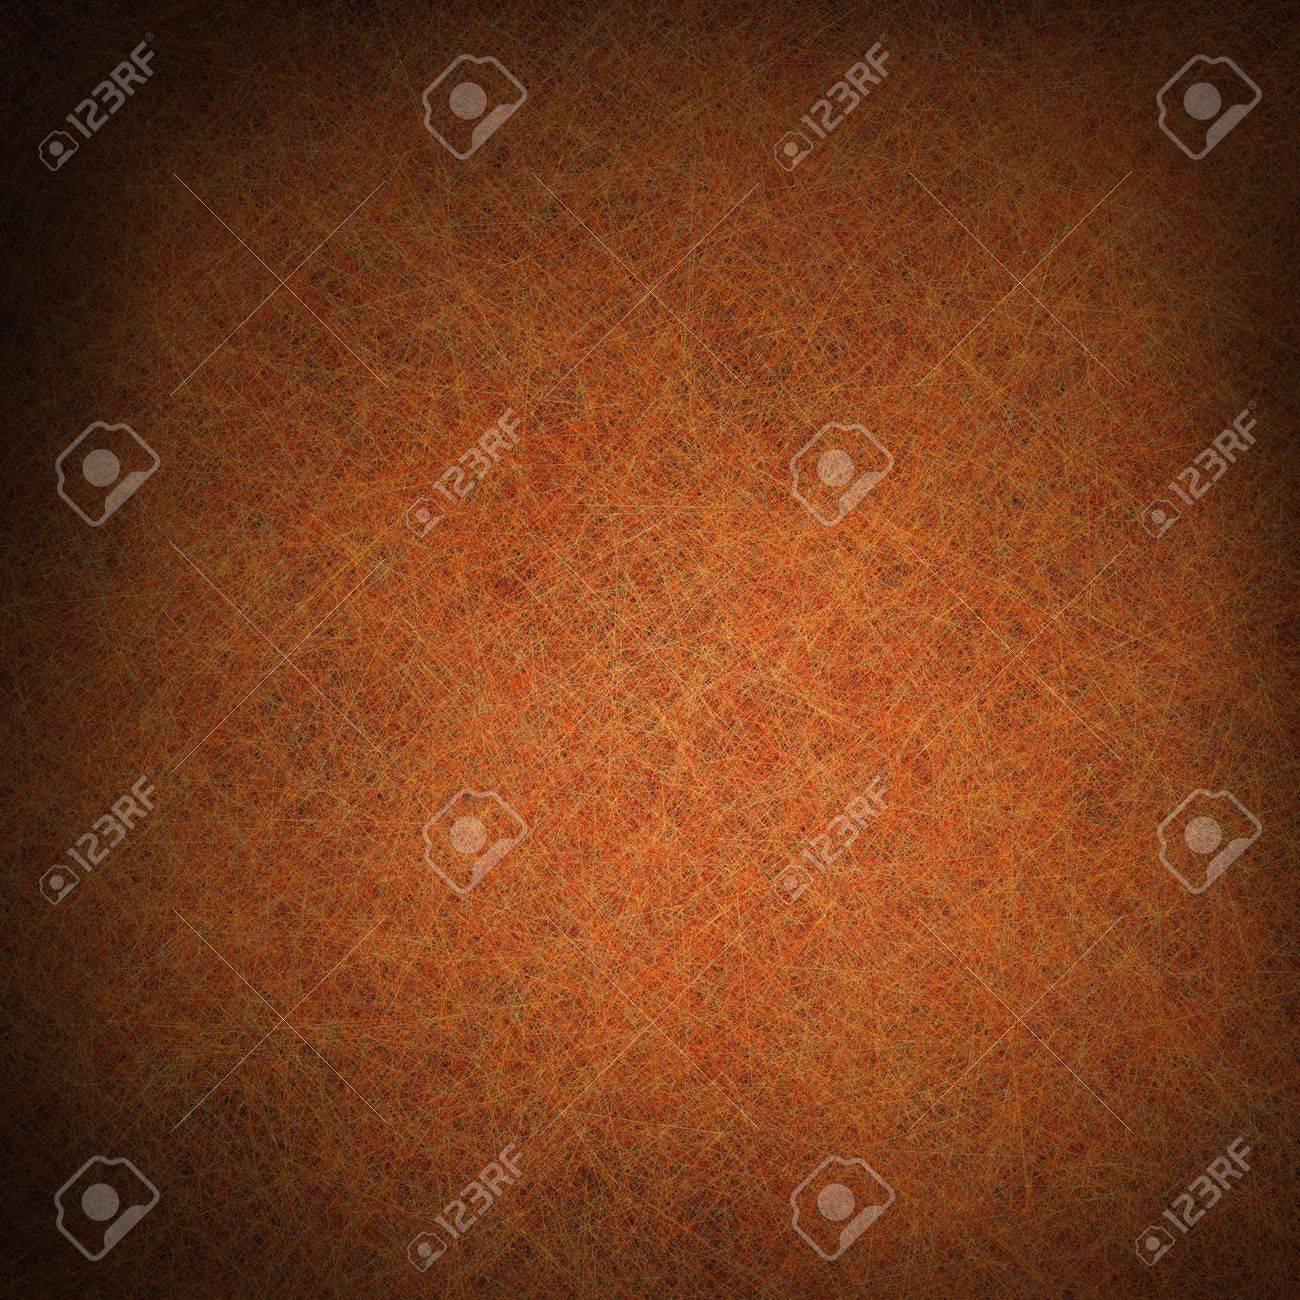 Oranje Bruine Achtergrond Met Zwarte Vignet Grens En Vintage ...